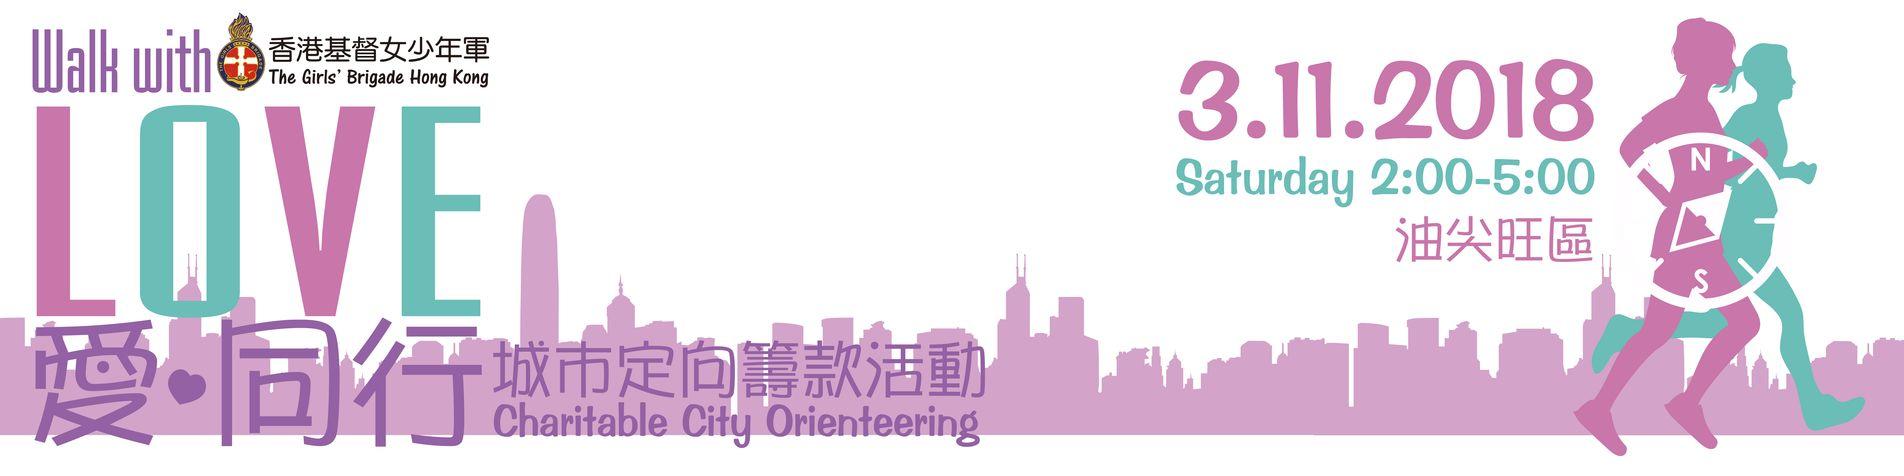 "FringeBacker Fundraiser ""Walk with LOVE"" Charitable City Orienteering"